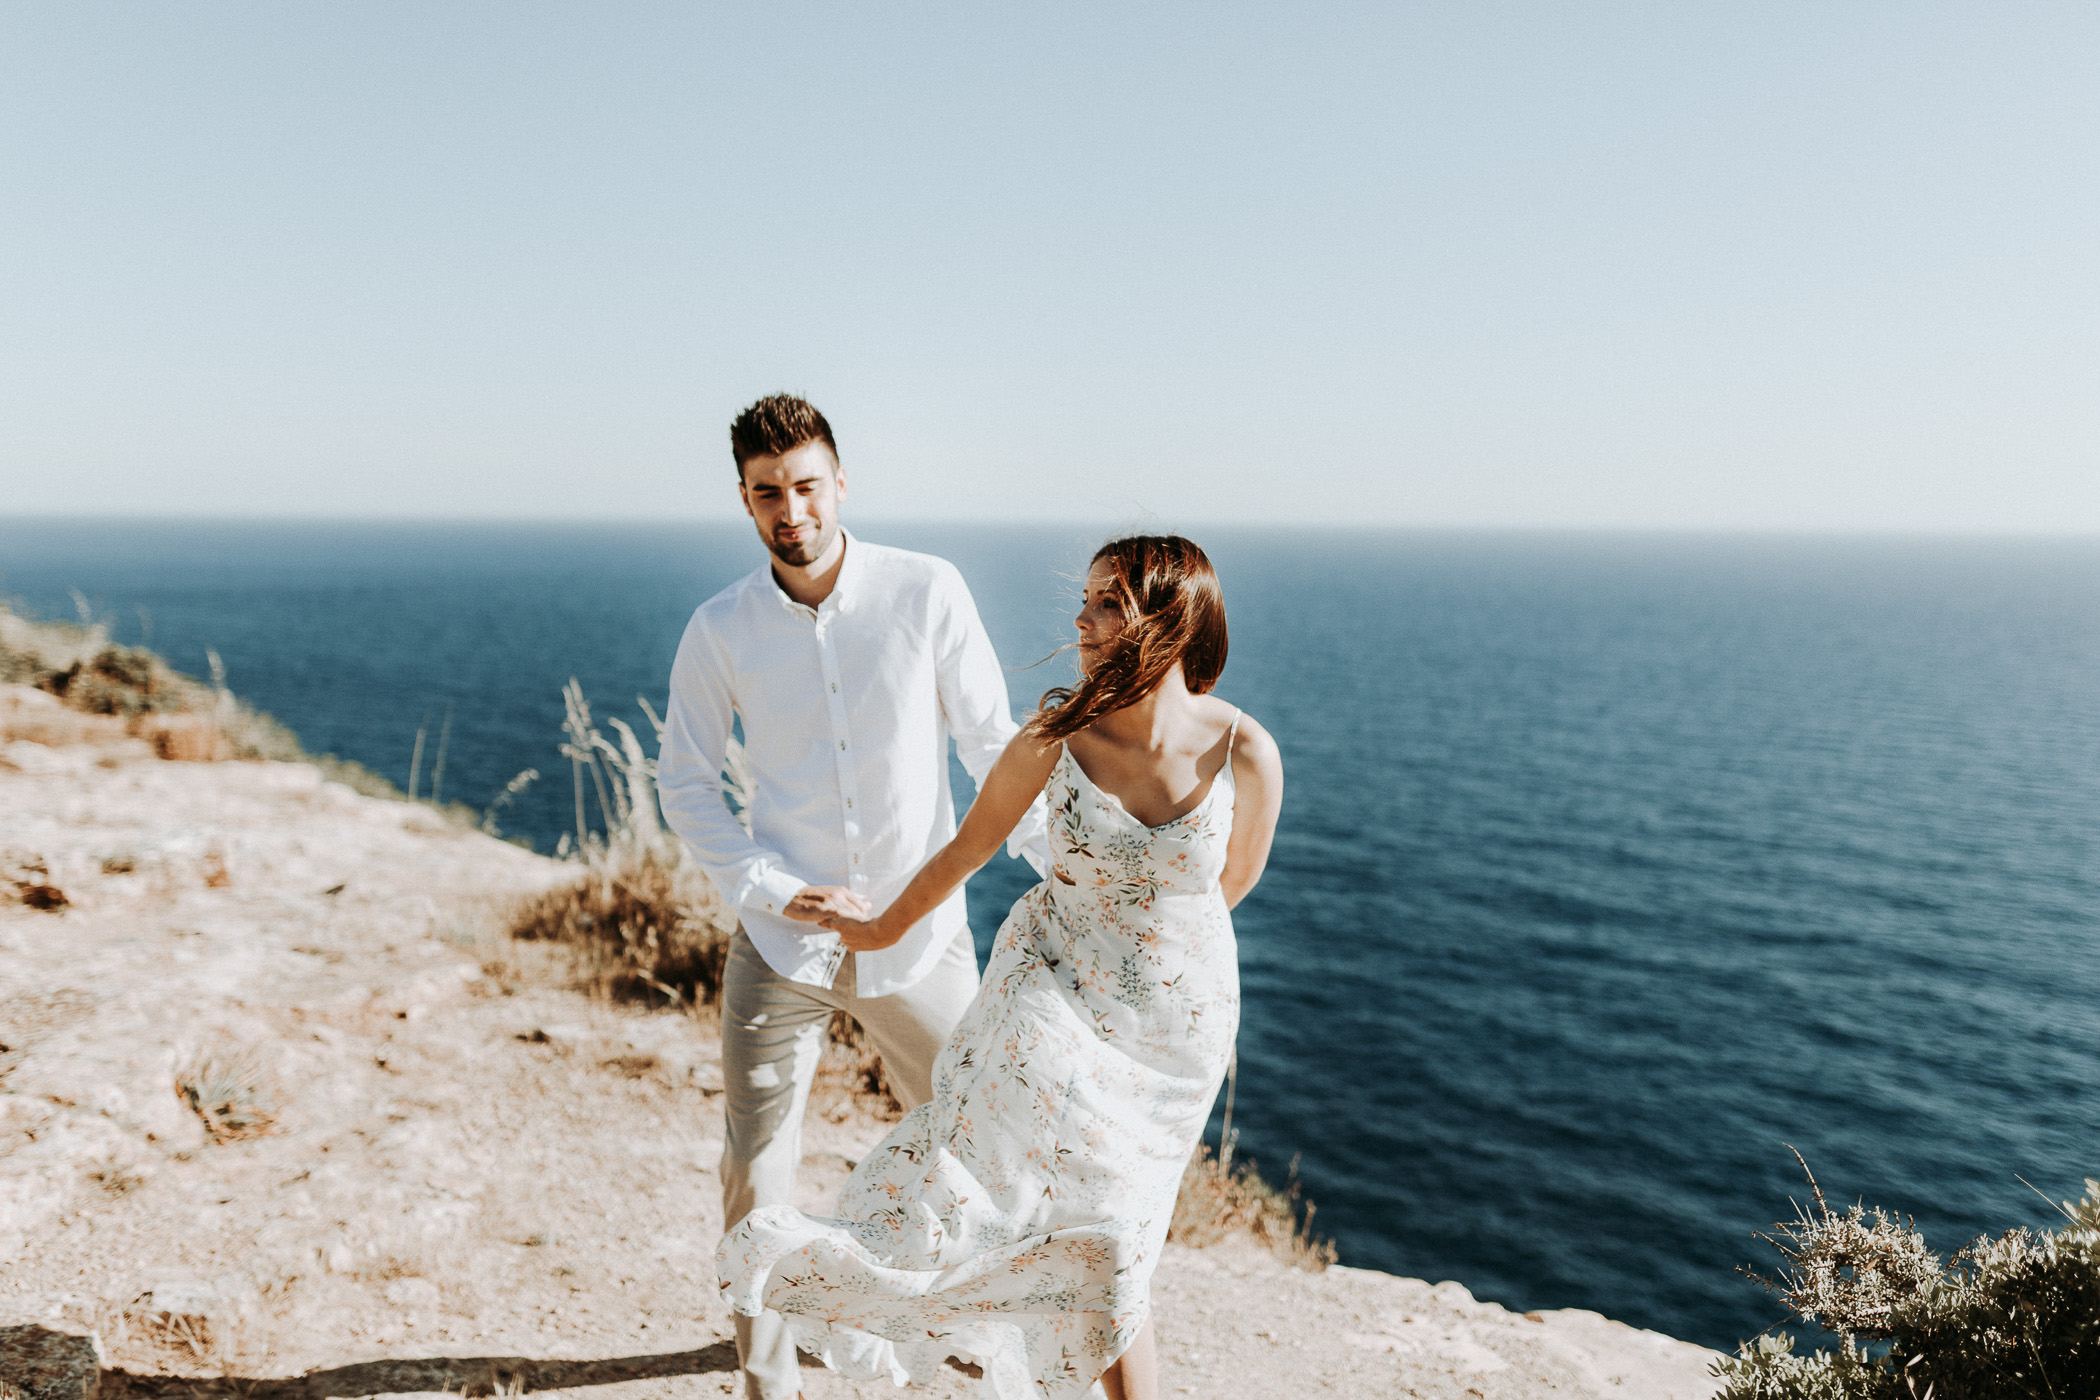 DanielaMarquardtPhotography_wedding_elopement_mallorca_spain_calapi_palma_lauraandtoni_24